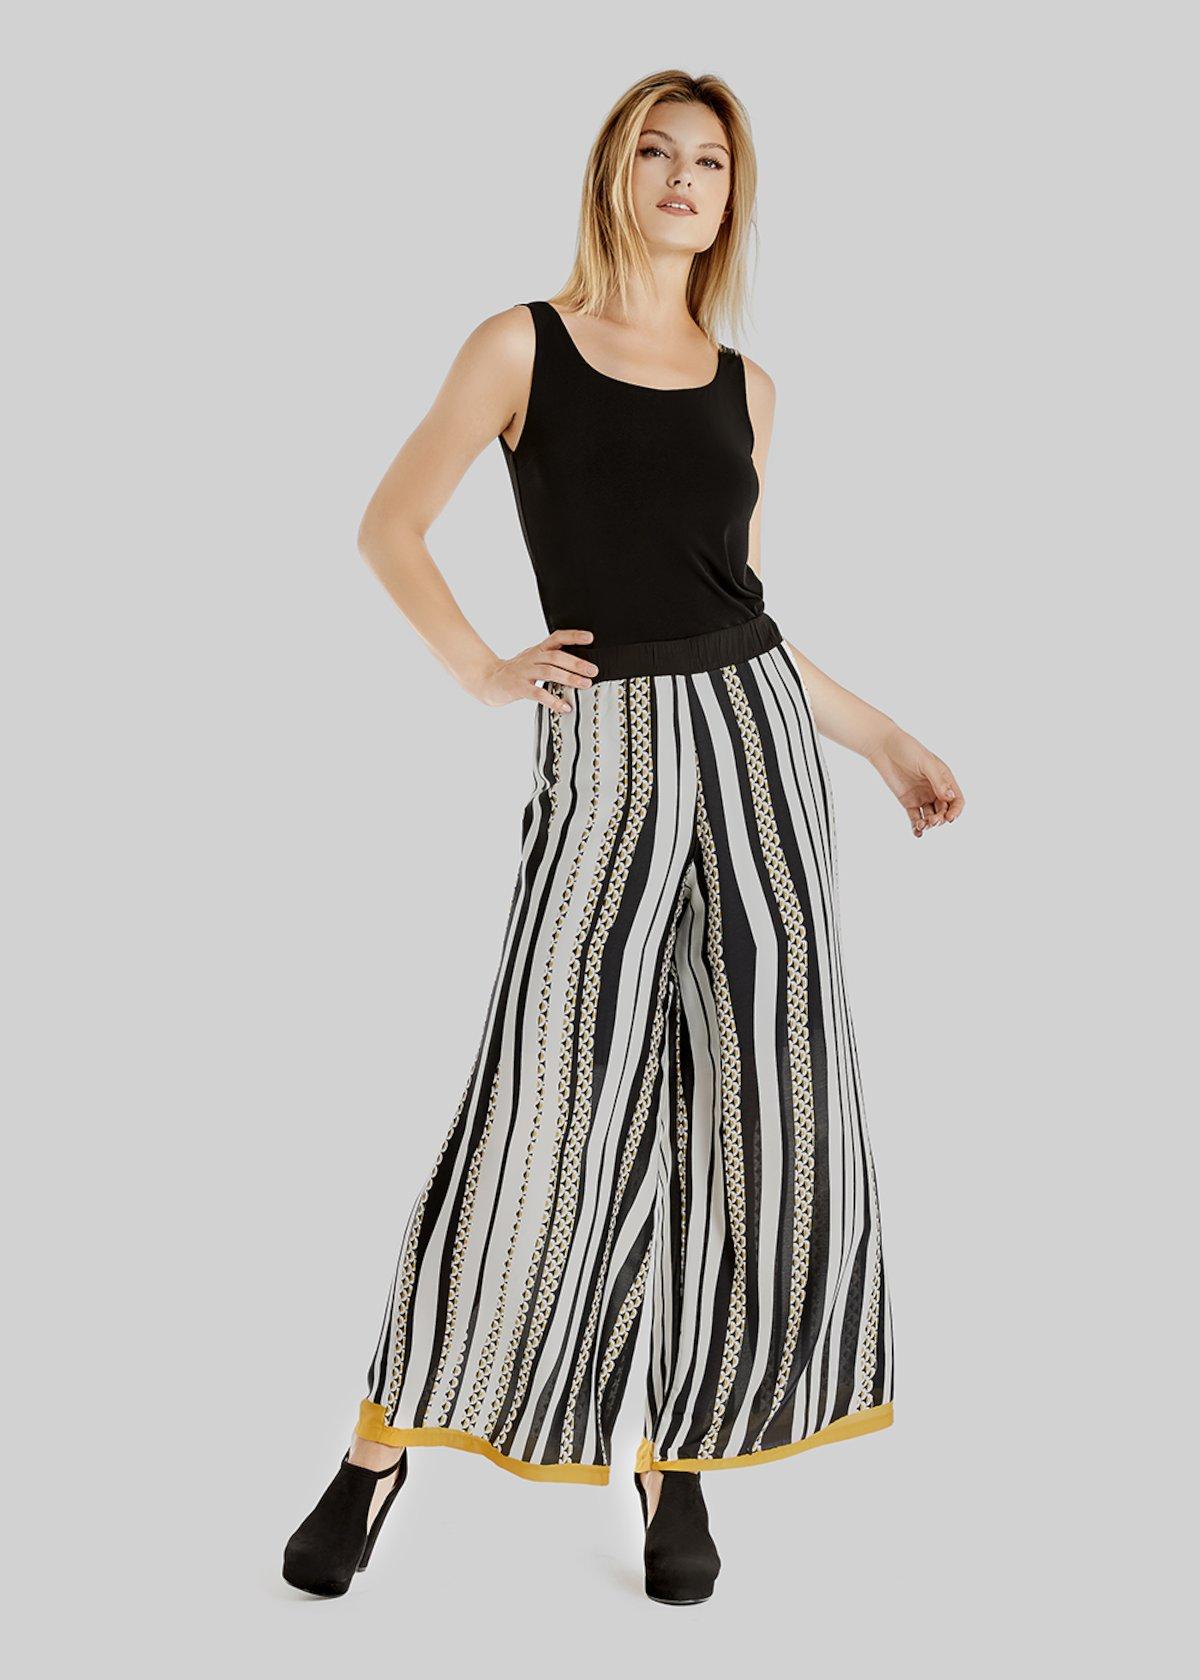 Pantaloni Payper in crepe halfmoon stripes fantasy